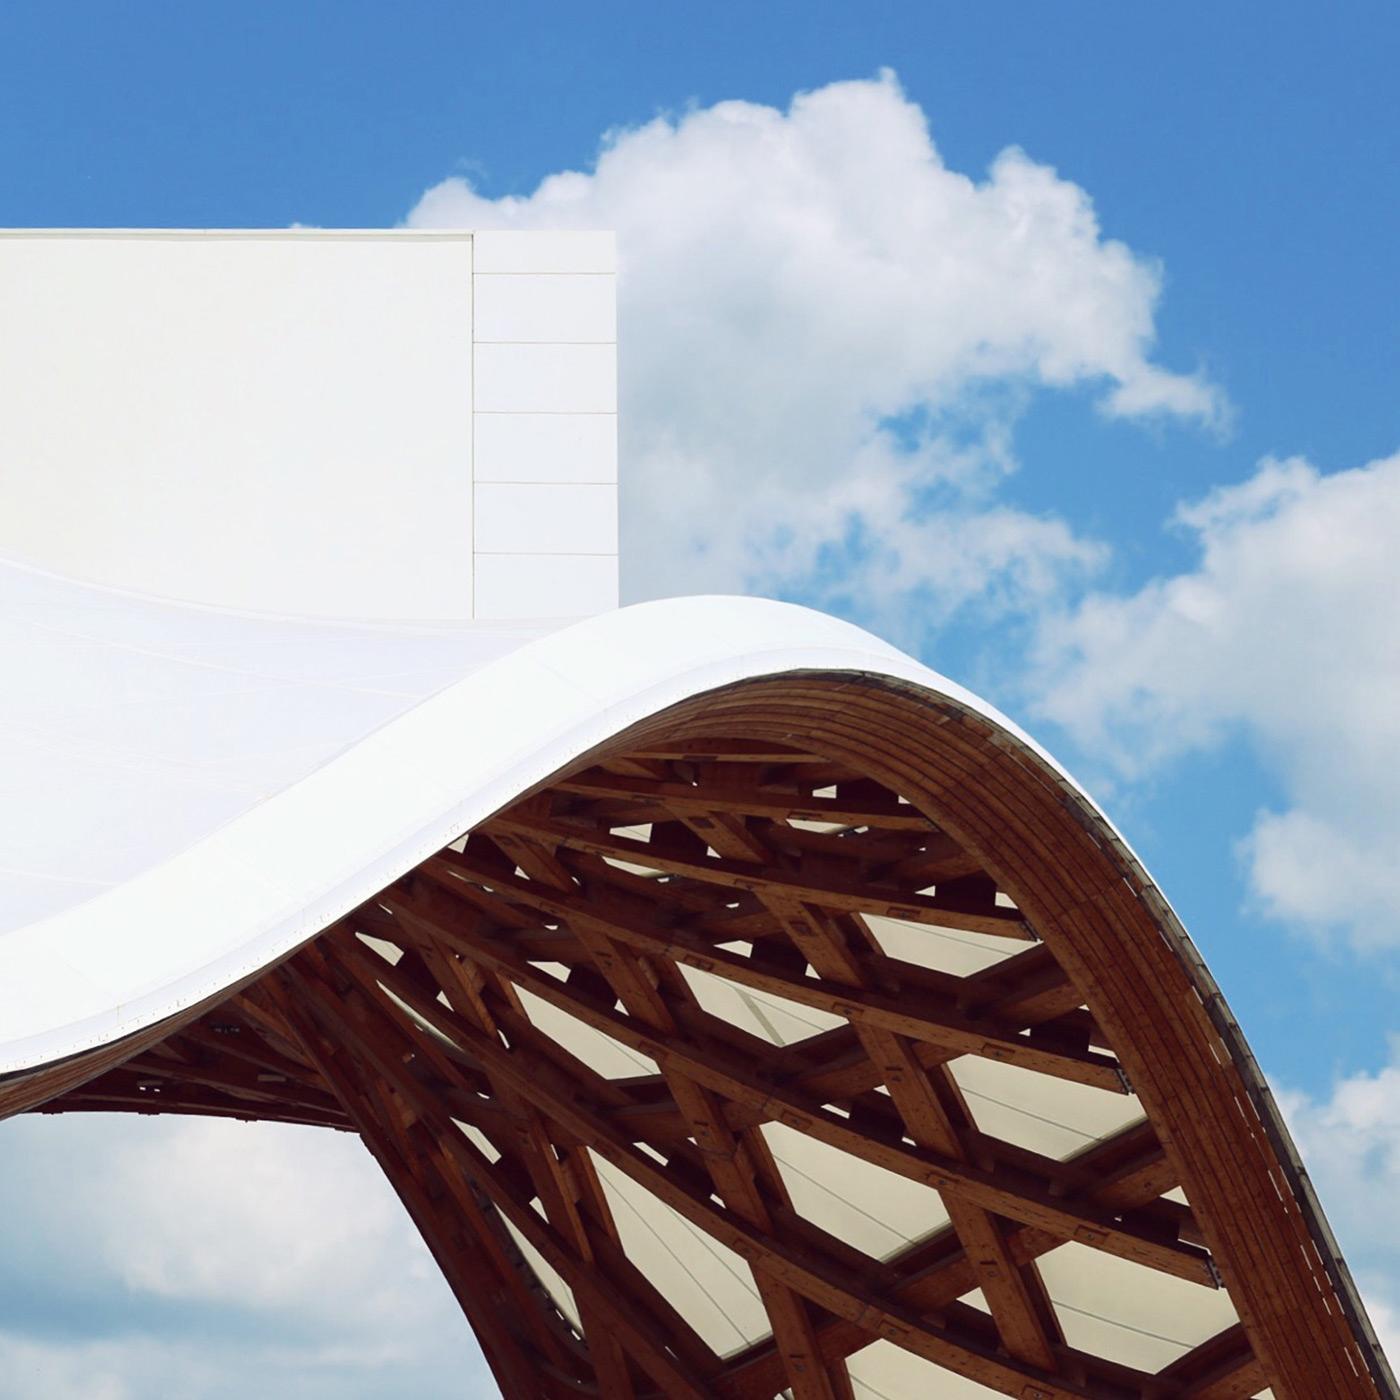 Centre Pompidou-Metz Location: Metz, France Architects: Shigeru Ban Architects